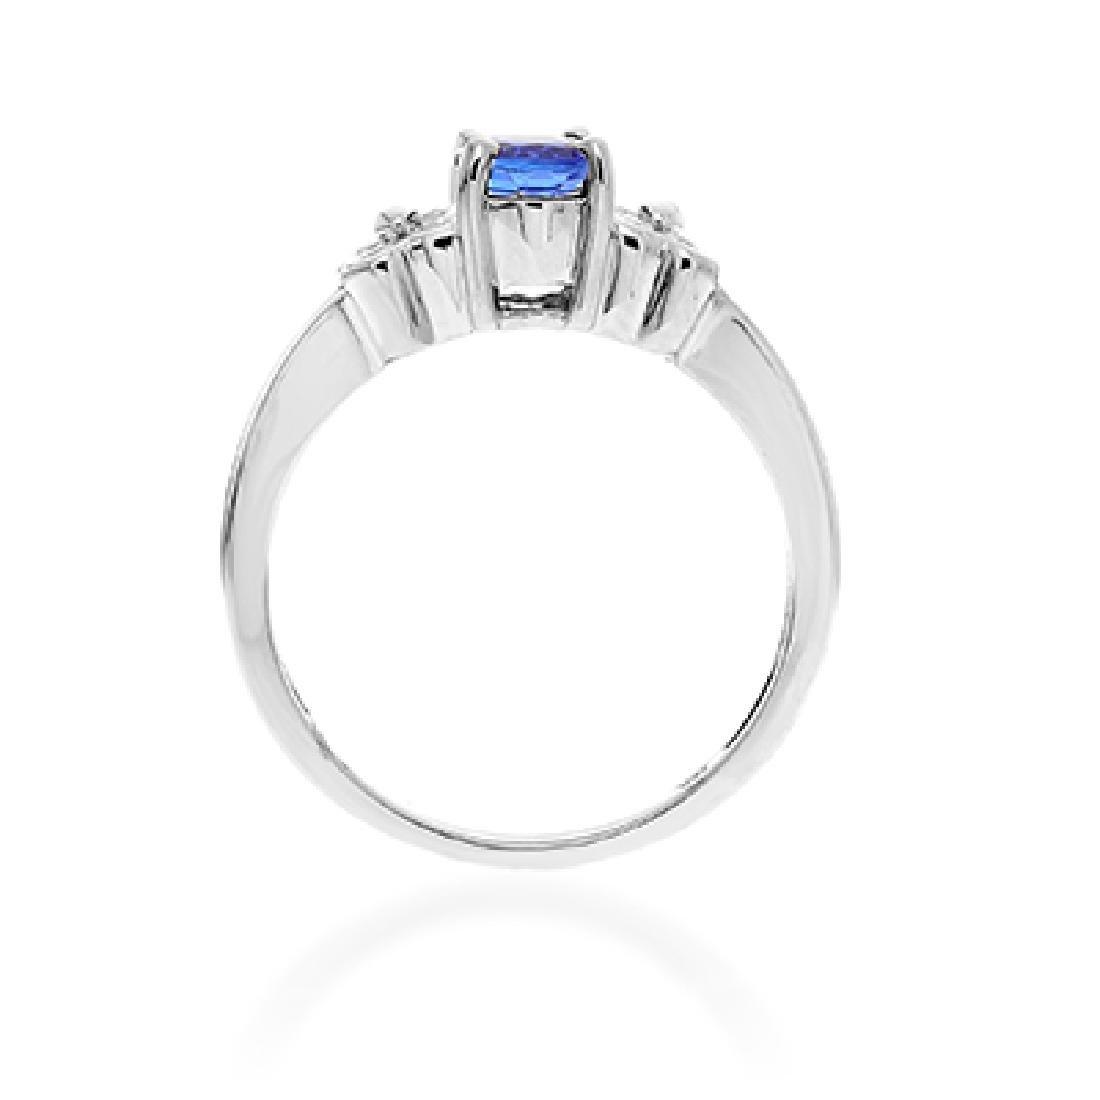 TANZANITE AND DIAMOND RING - 3